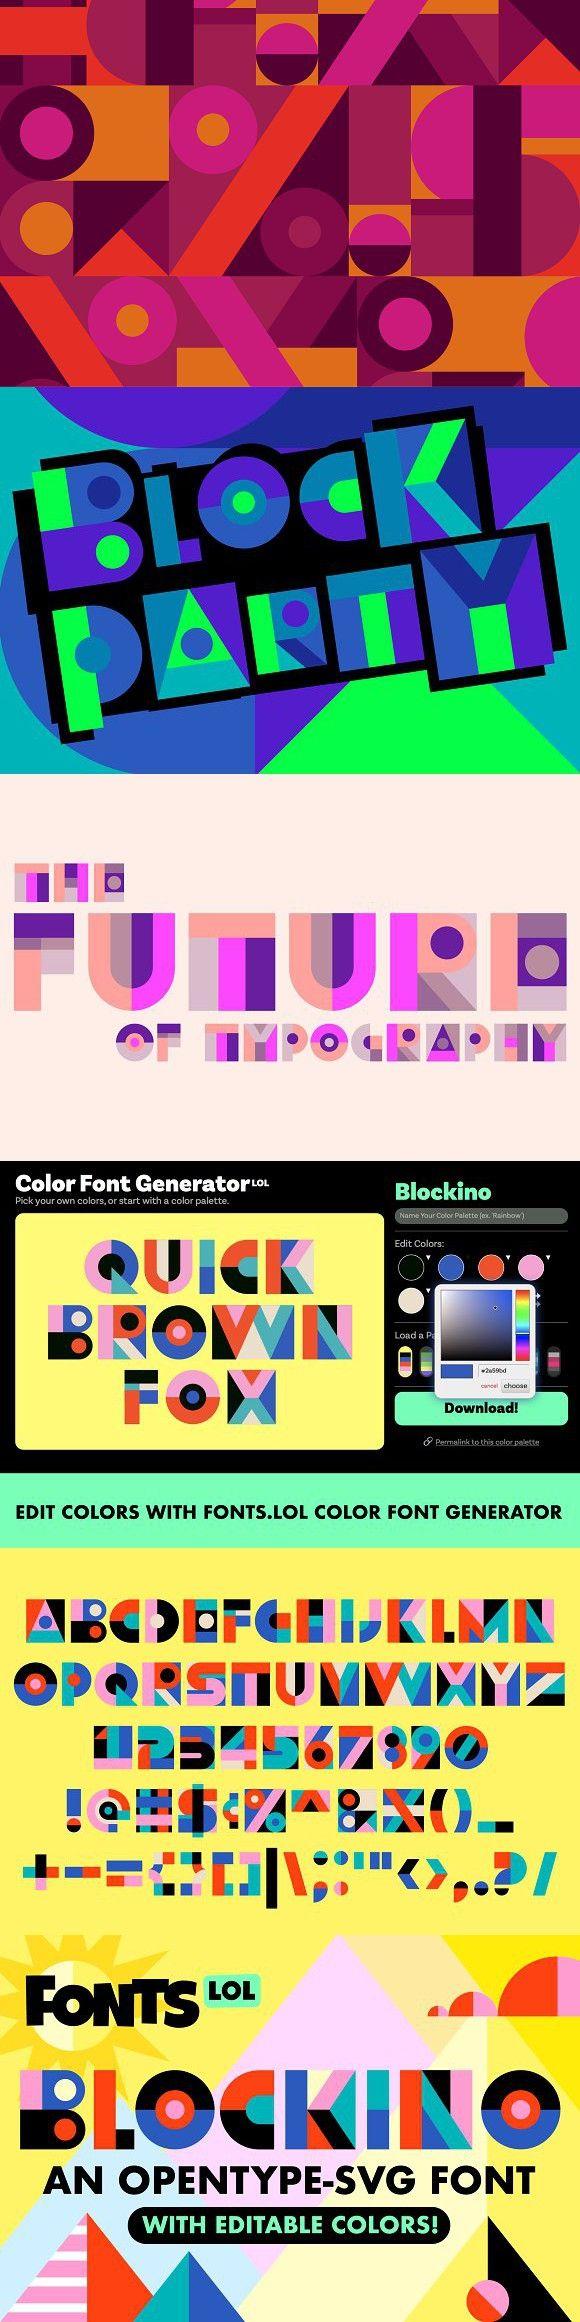 Blockino OpentypeSVG Color Font Font graphic, Fonts